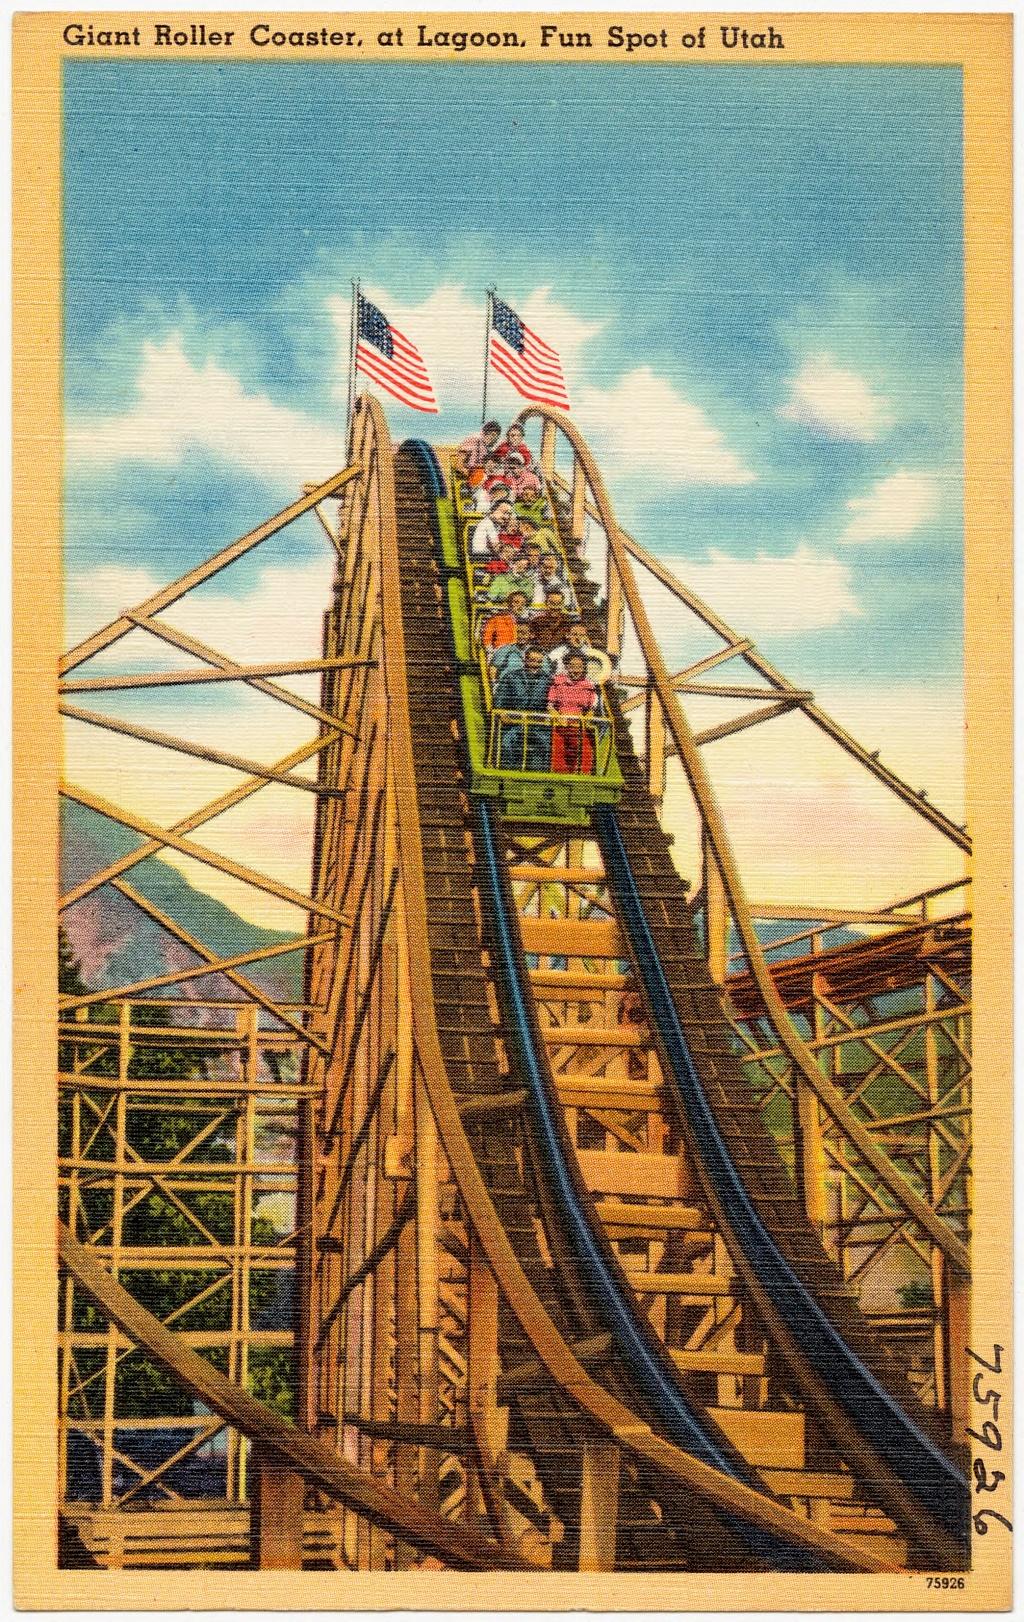 Giant_roller_coaster,_at_Lagoon,_fun_spot_of_Utah postcard